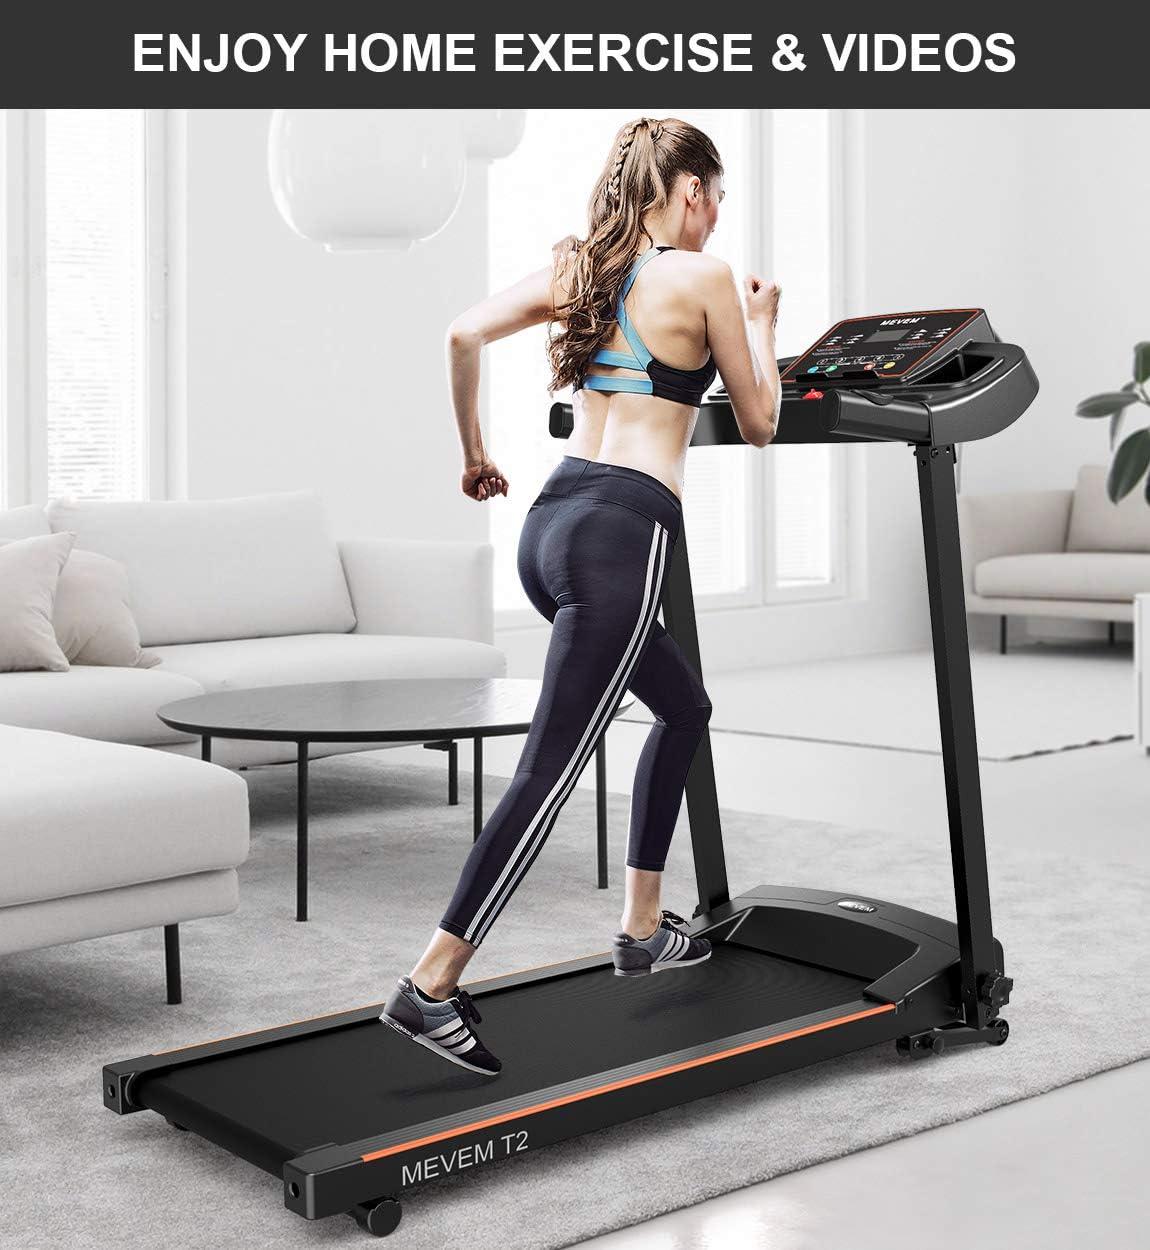 Free Amazon Promo Code 2020 for Treadmill Electric Folding Treadmills